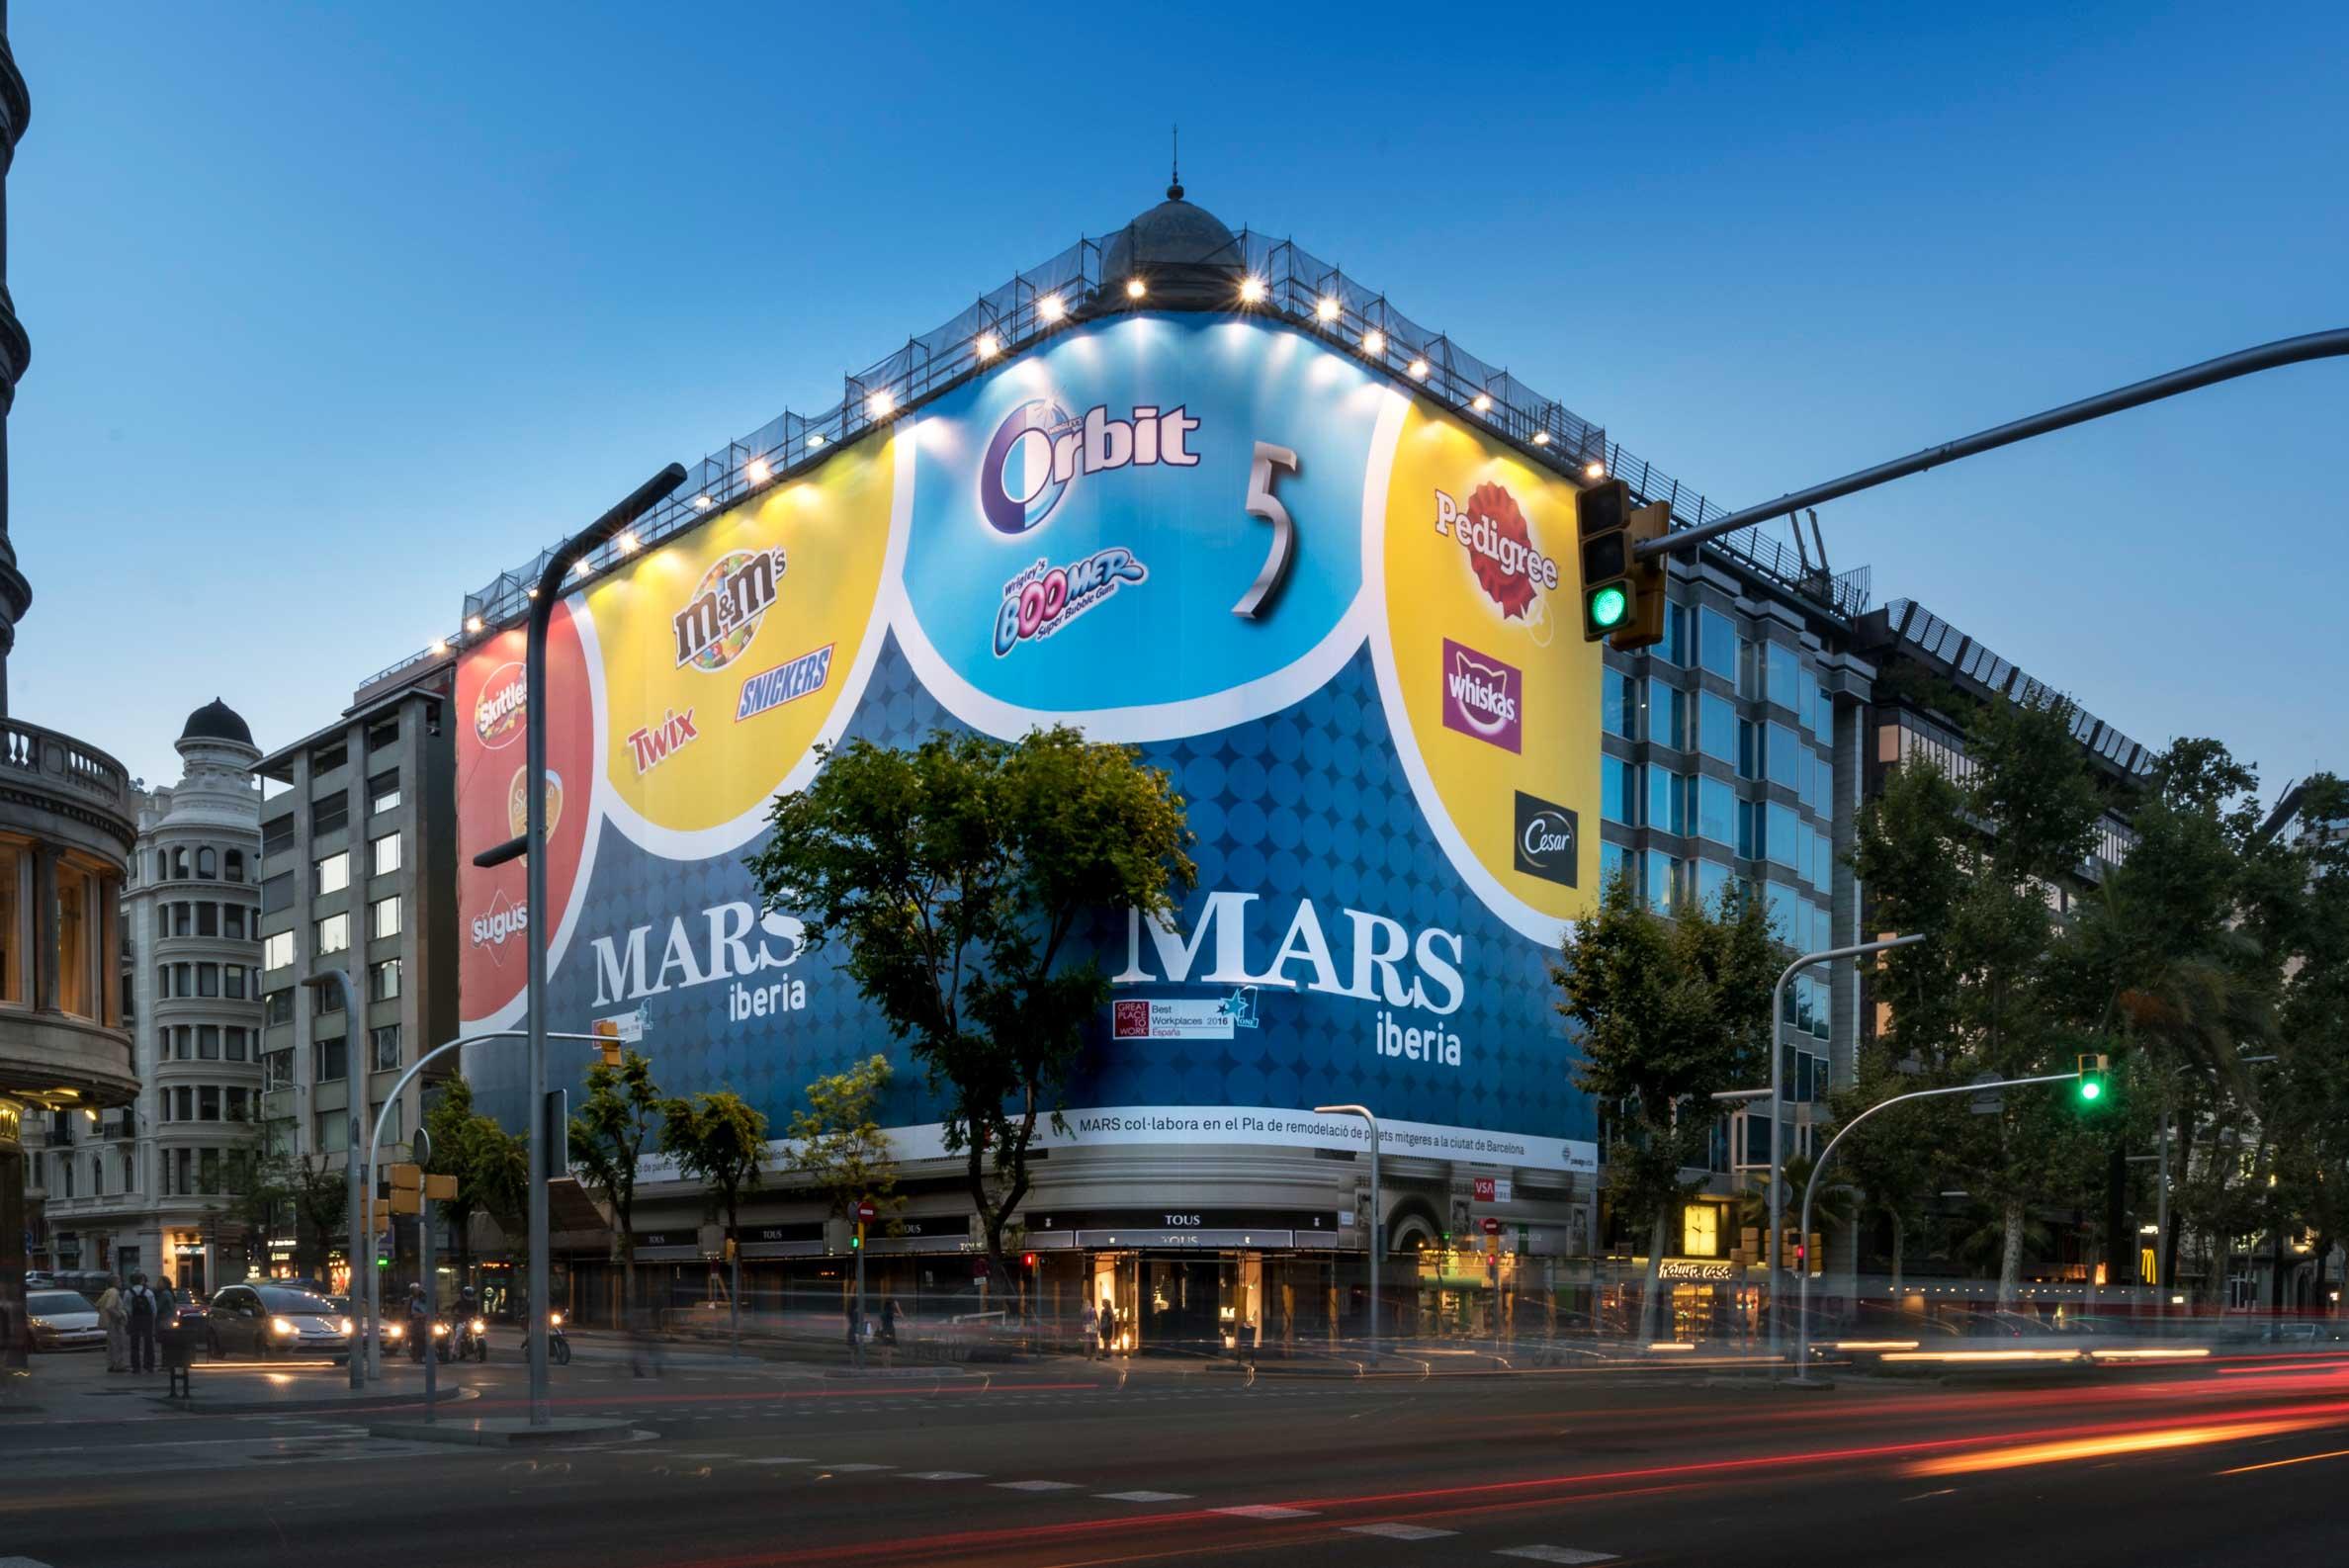 lona-publicitaria-barcelona-avenida-diagonal-478-mars-iberia-frontal-vsa-comunicacion